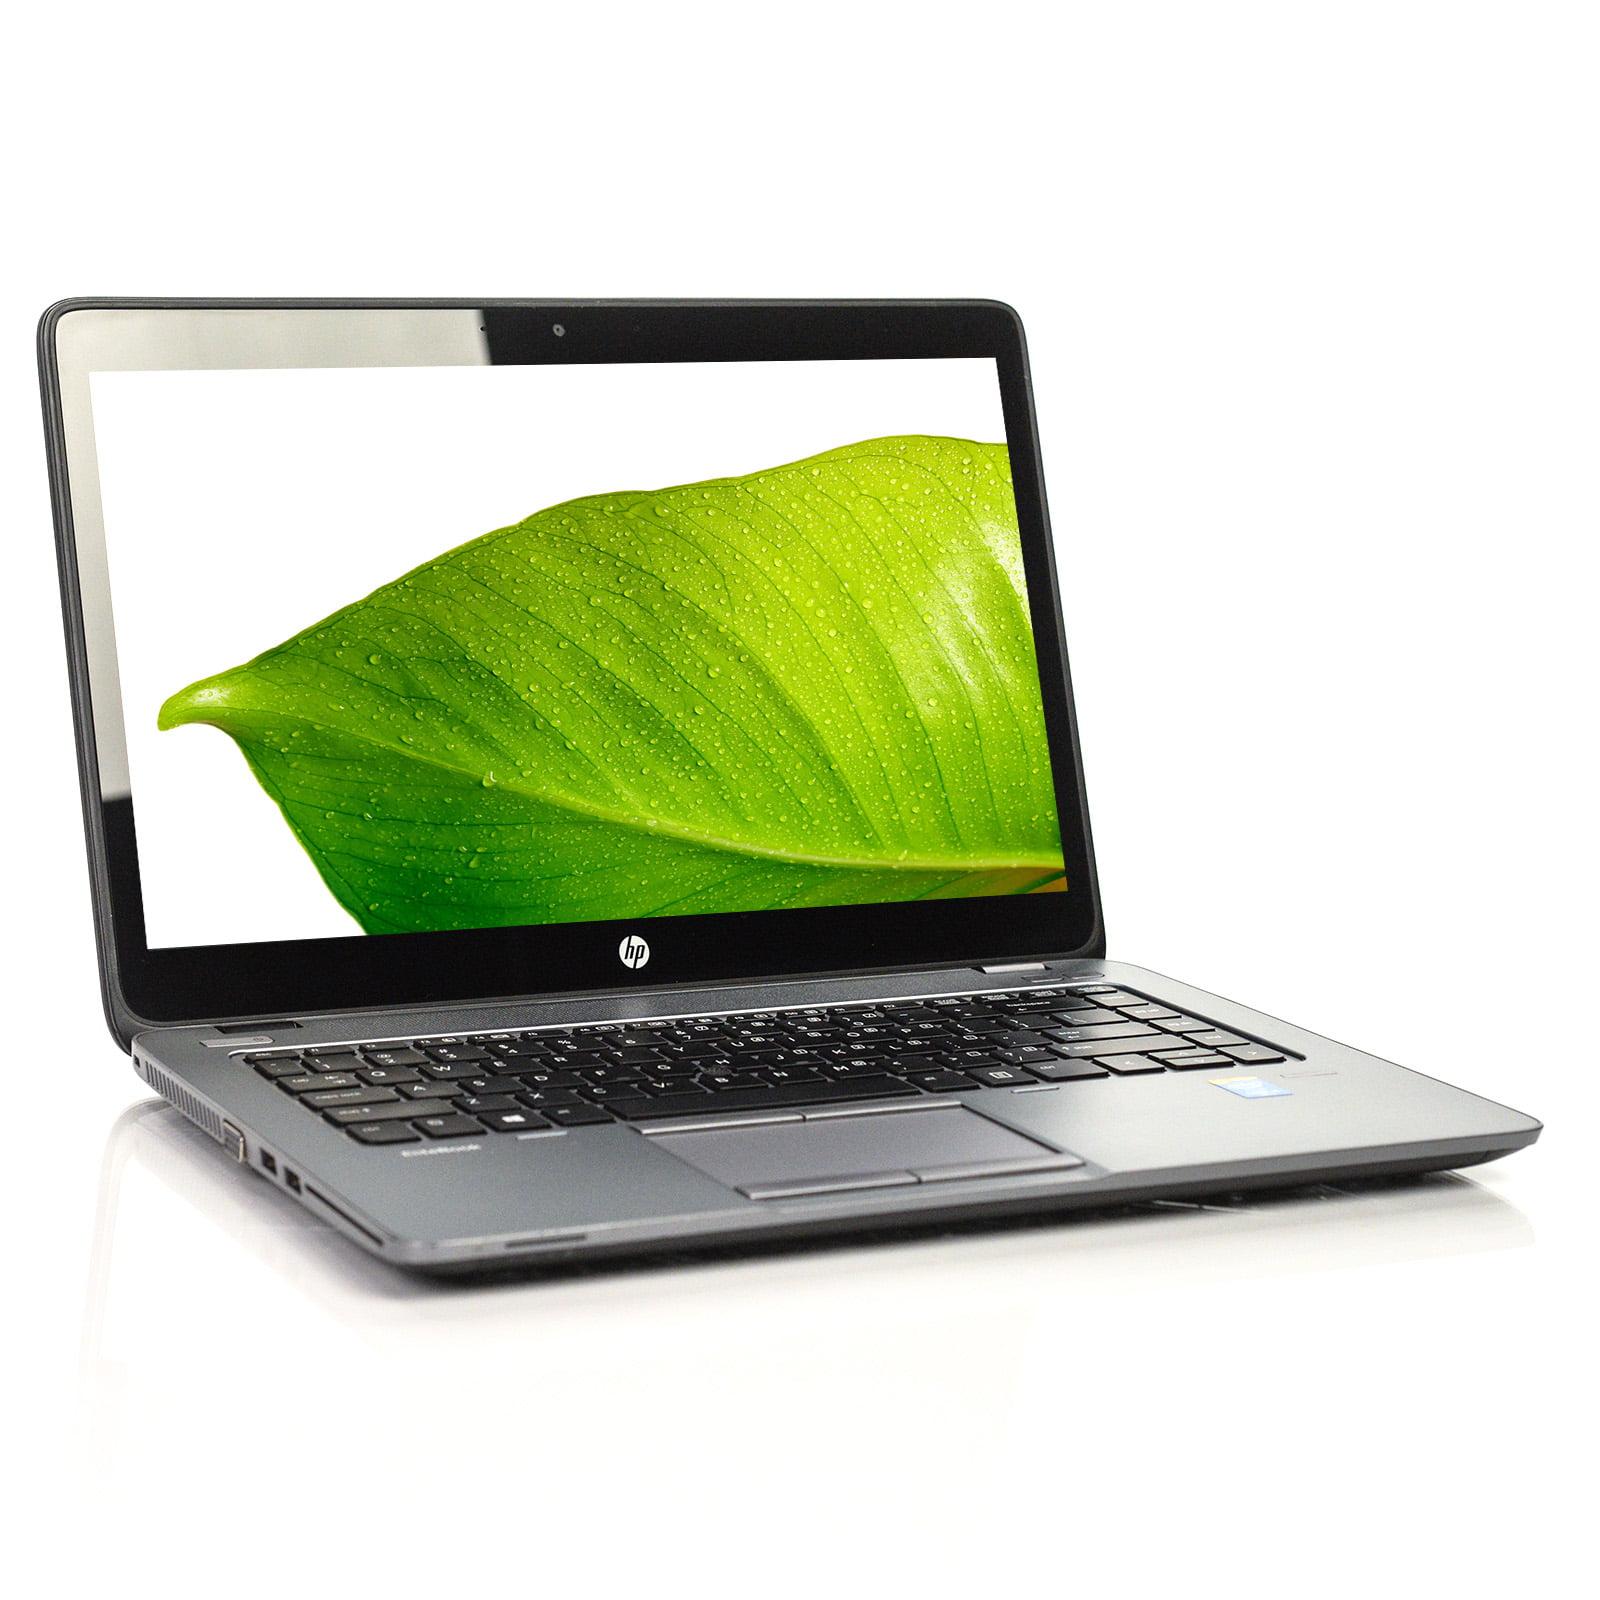 Refurbished HP EliteBook 840 G2 Ultrabook i5 Dual-Core 4GB 256GB SSD Win 10  Pro A v WCA